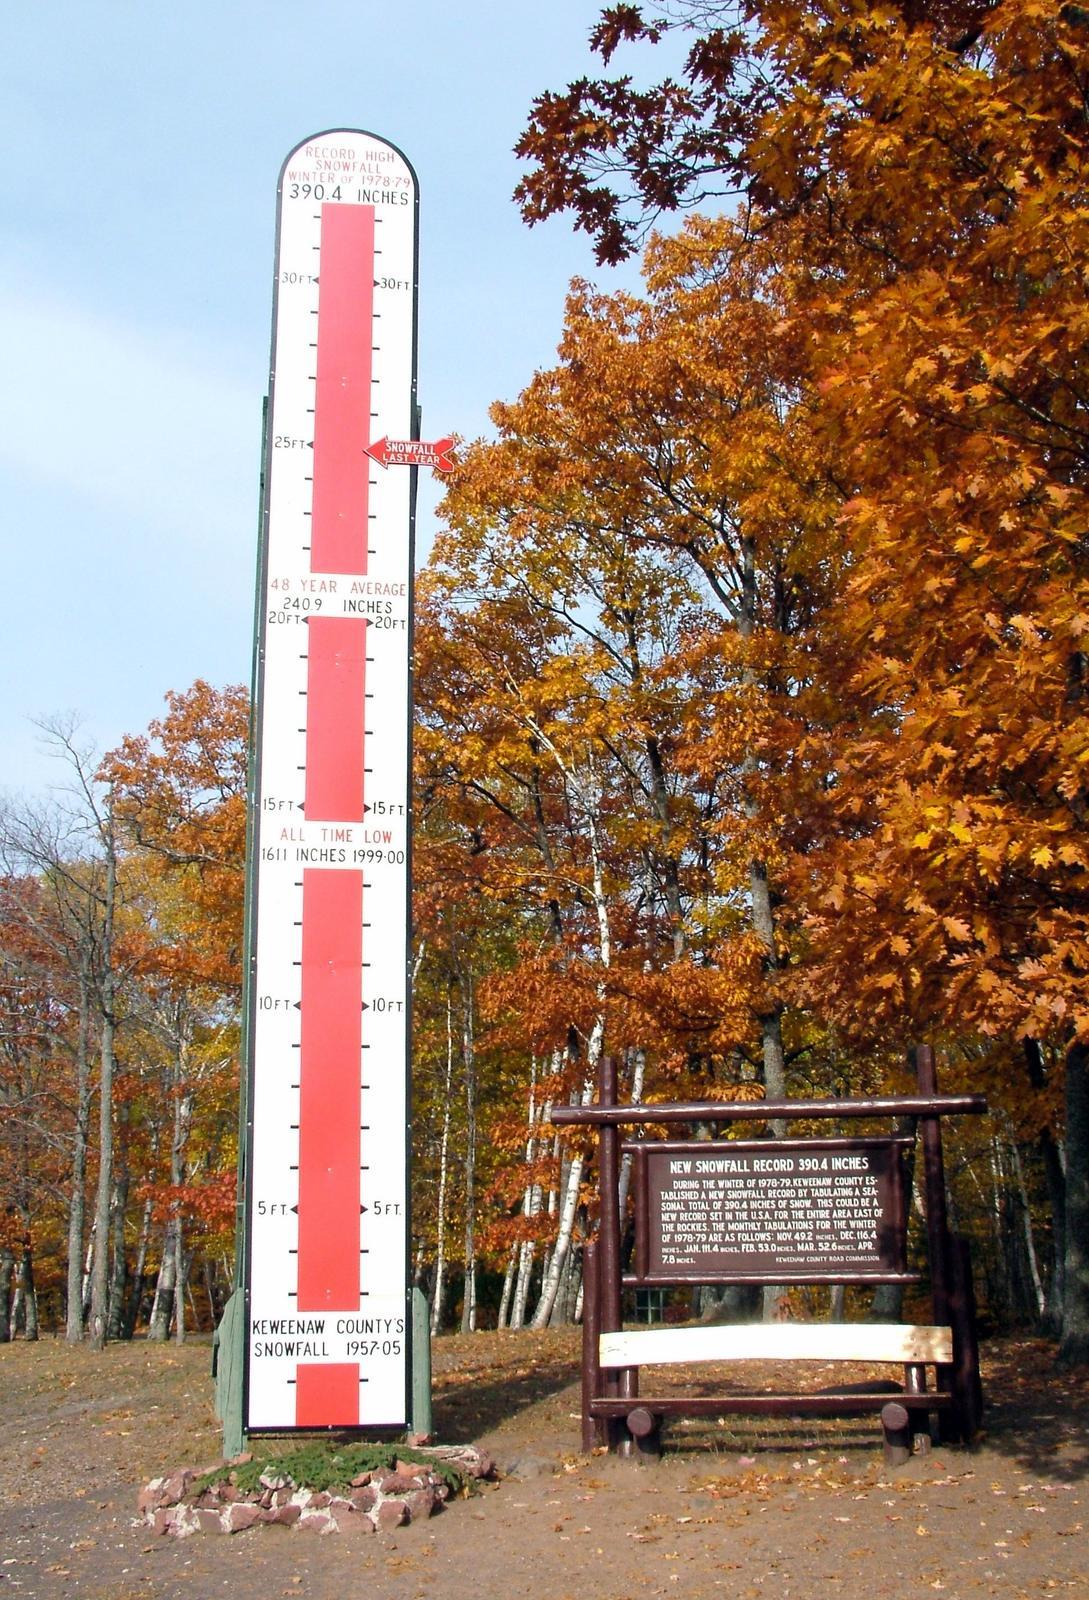 Keweenaw_Snow_Thermometer.jpg